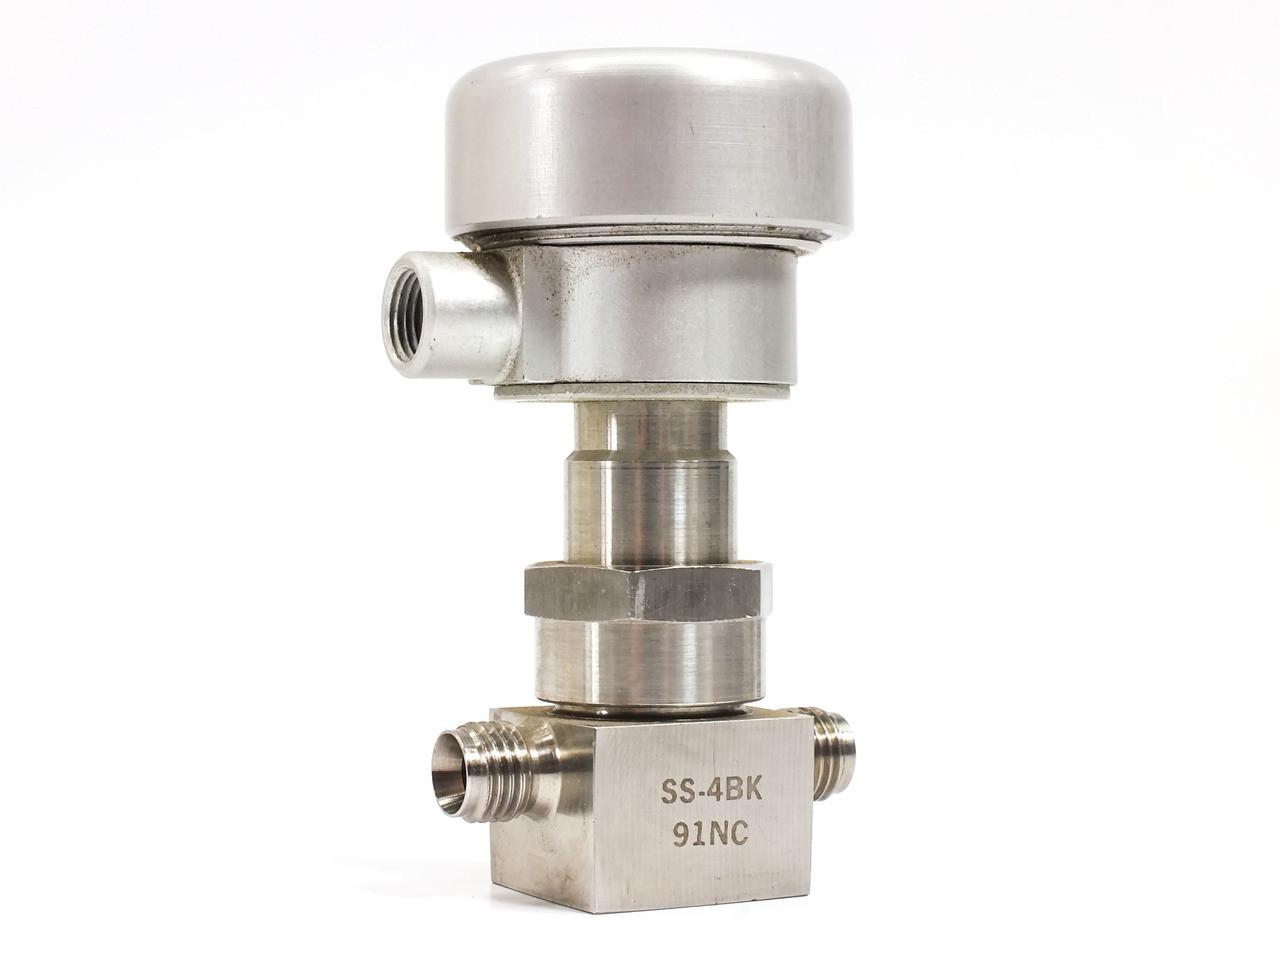 Nupro ss bk nc pneumatic actuated bellows valve